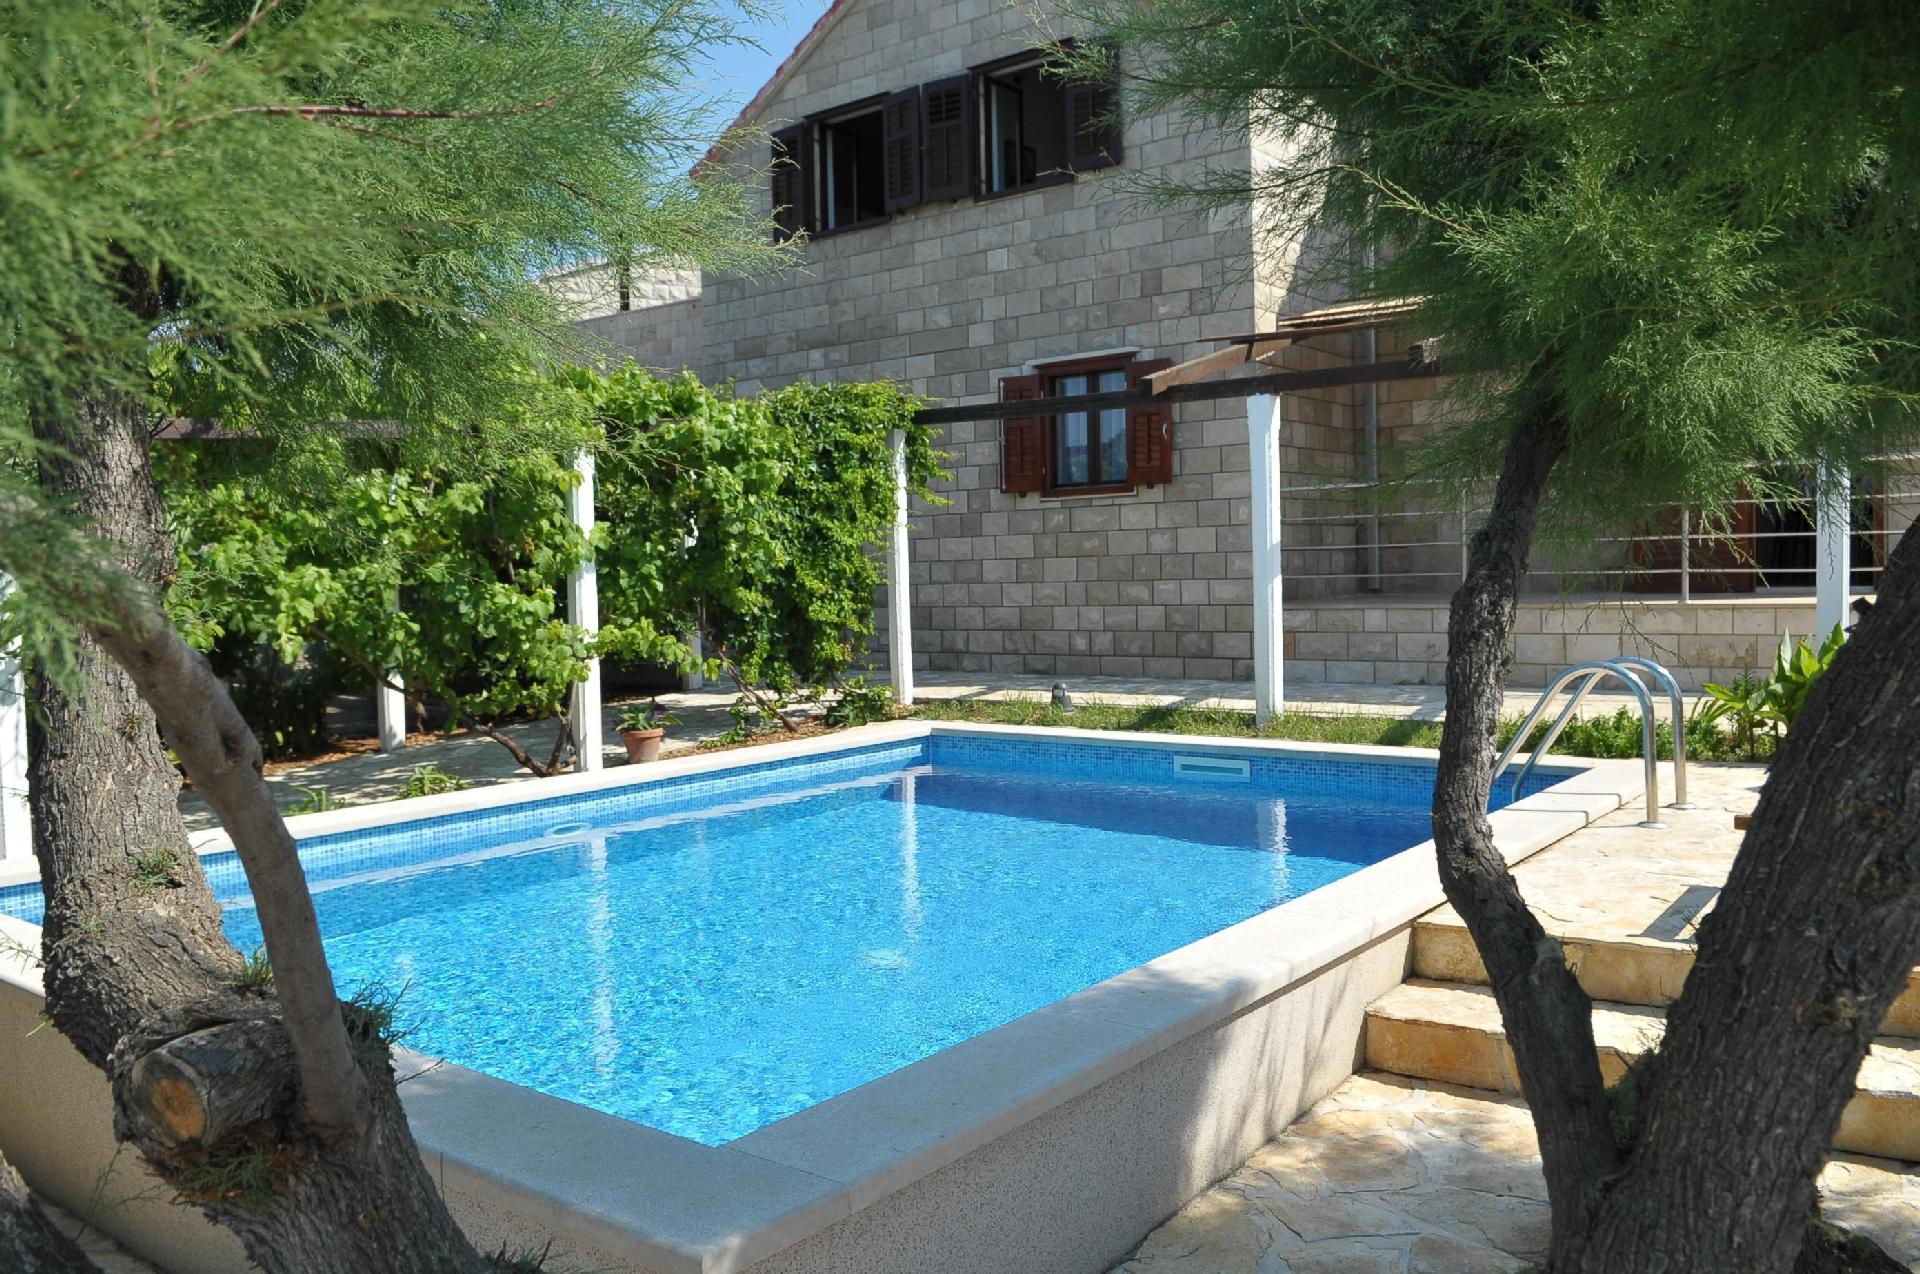 Großes Ferienhaus mit Garten, eigenem Pool,  Bauernhof in Kroatien